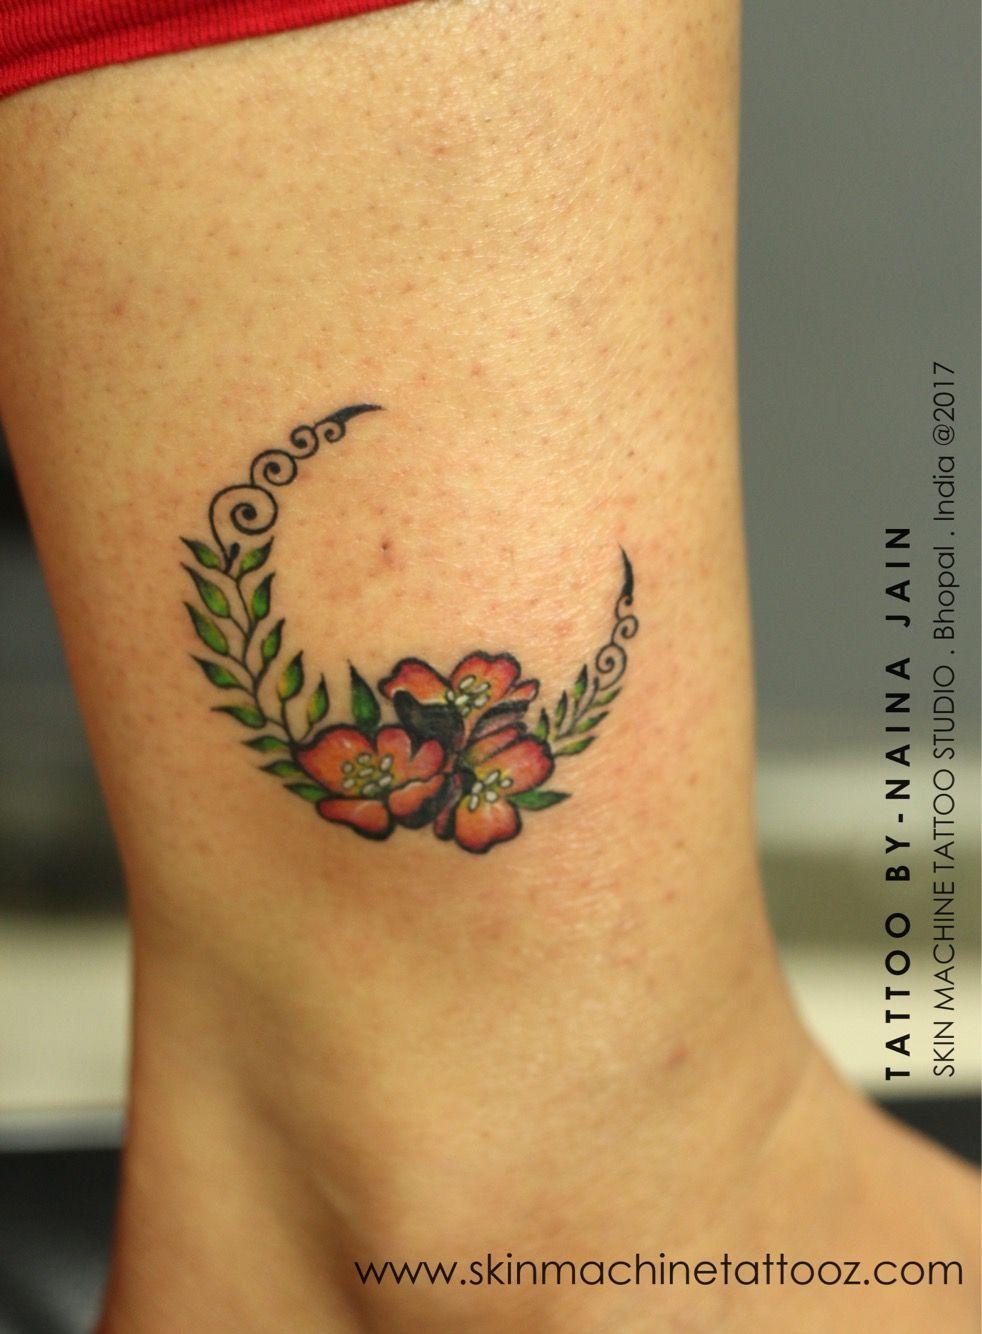 2081c4413 Half Moon with flowers Tattoo by Naina Jain @nains_tattoos Follow for more  artwork - Skin